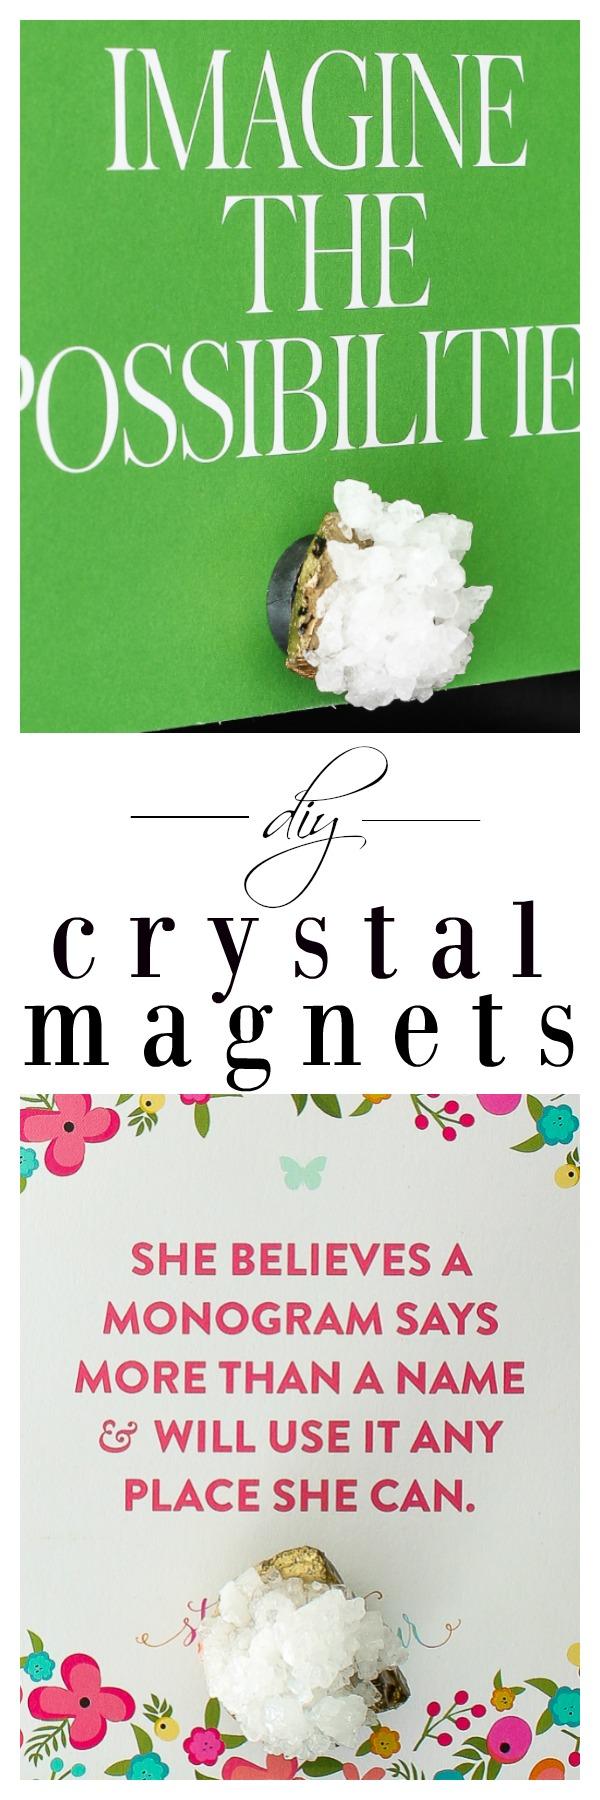 How to Make Crystal Magnets | DIY Crystal Magnets | DIY Crystal Crafts | Easy Crafts | How to Make Crystals DIY | Crystal Magnets | DIY Magnets